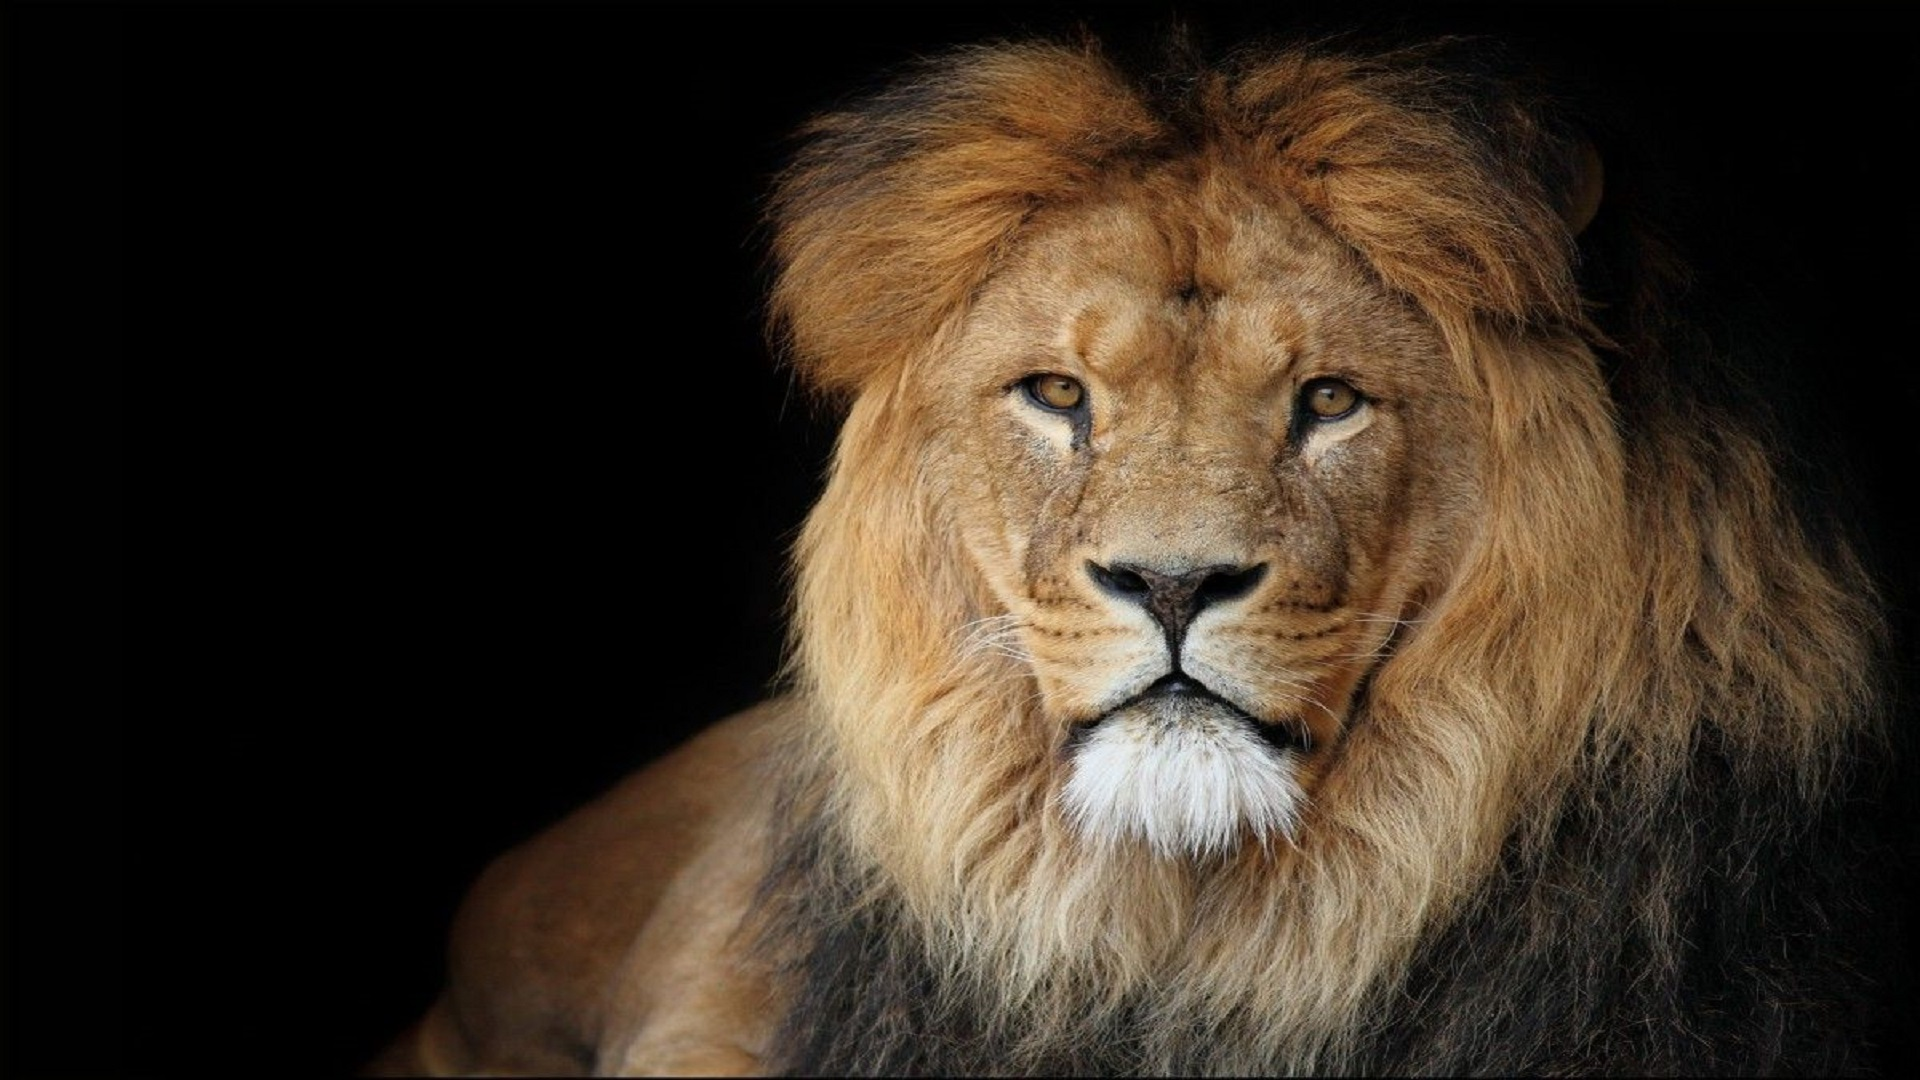 Beautiful African Lion Wallpaper Hd Free Downloaded